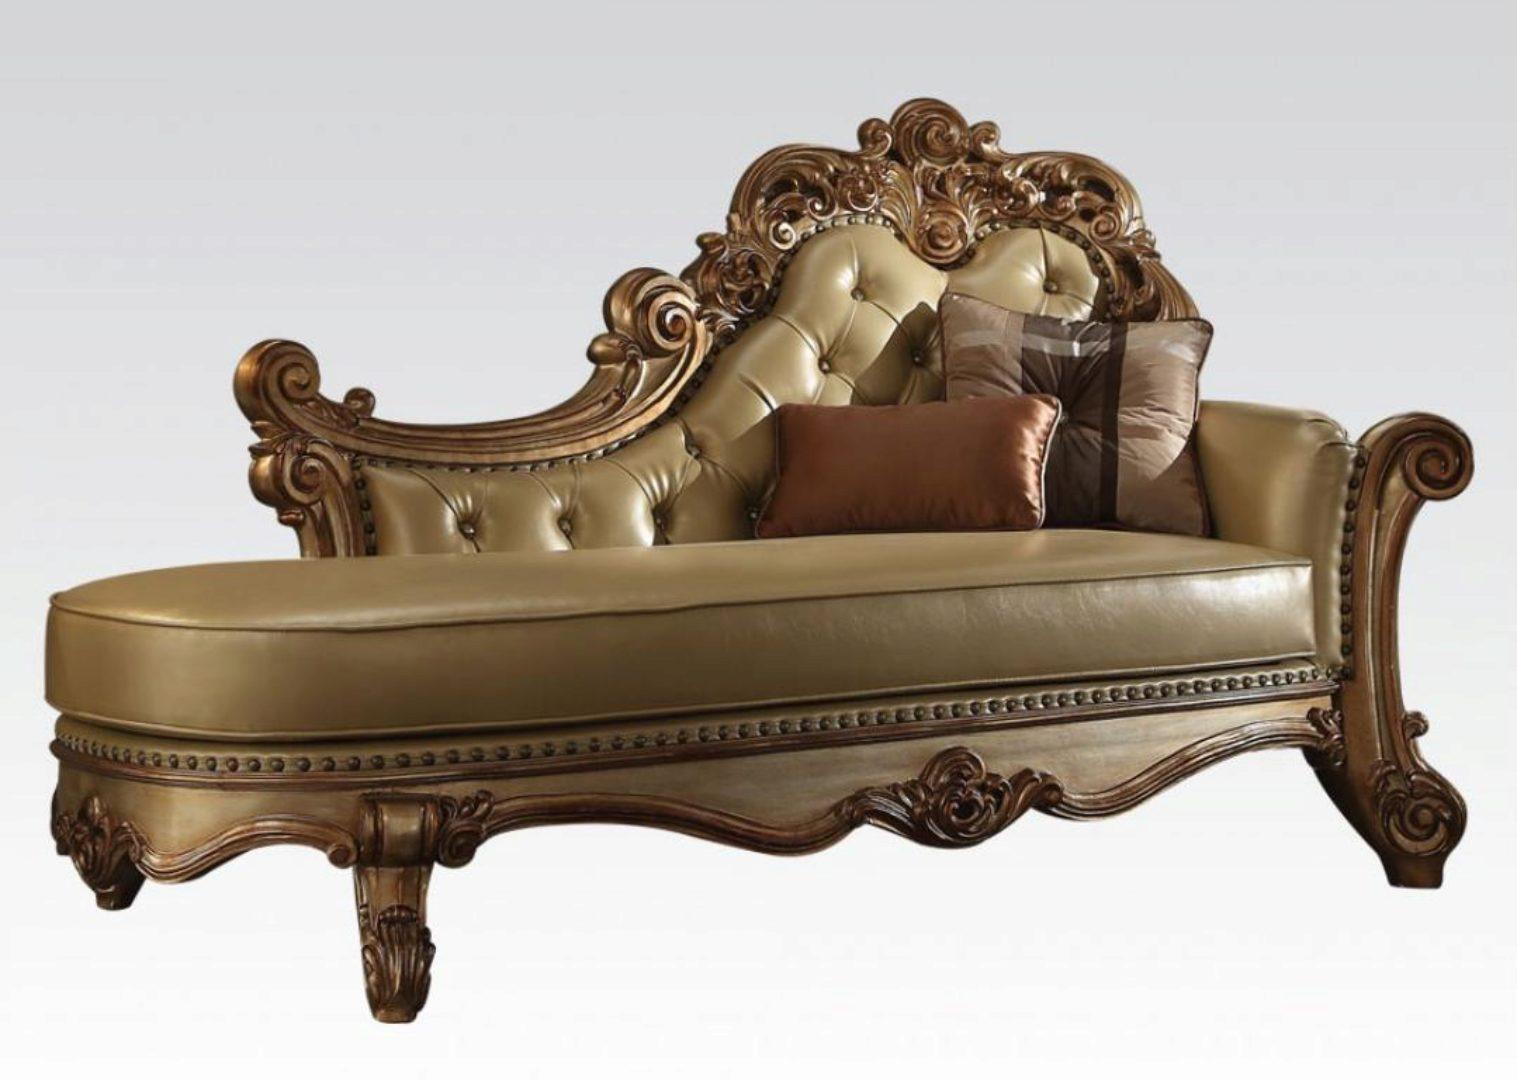 Acme Furniture 96485 Vendome Bone Gold Patina Tufted Chaise Lounge 96485 Vendome Chaise